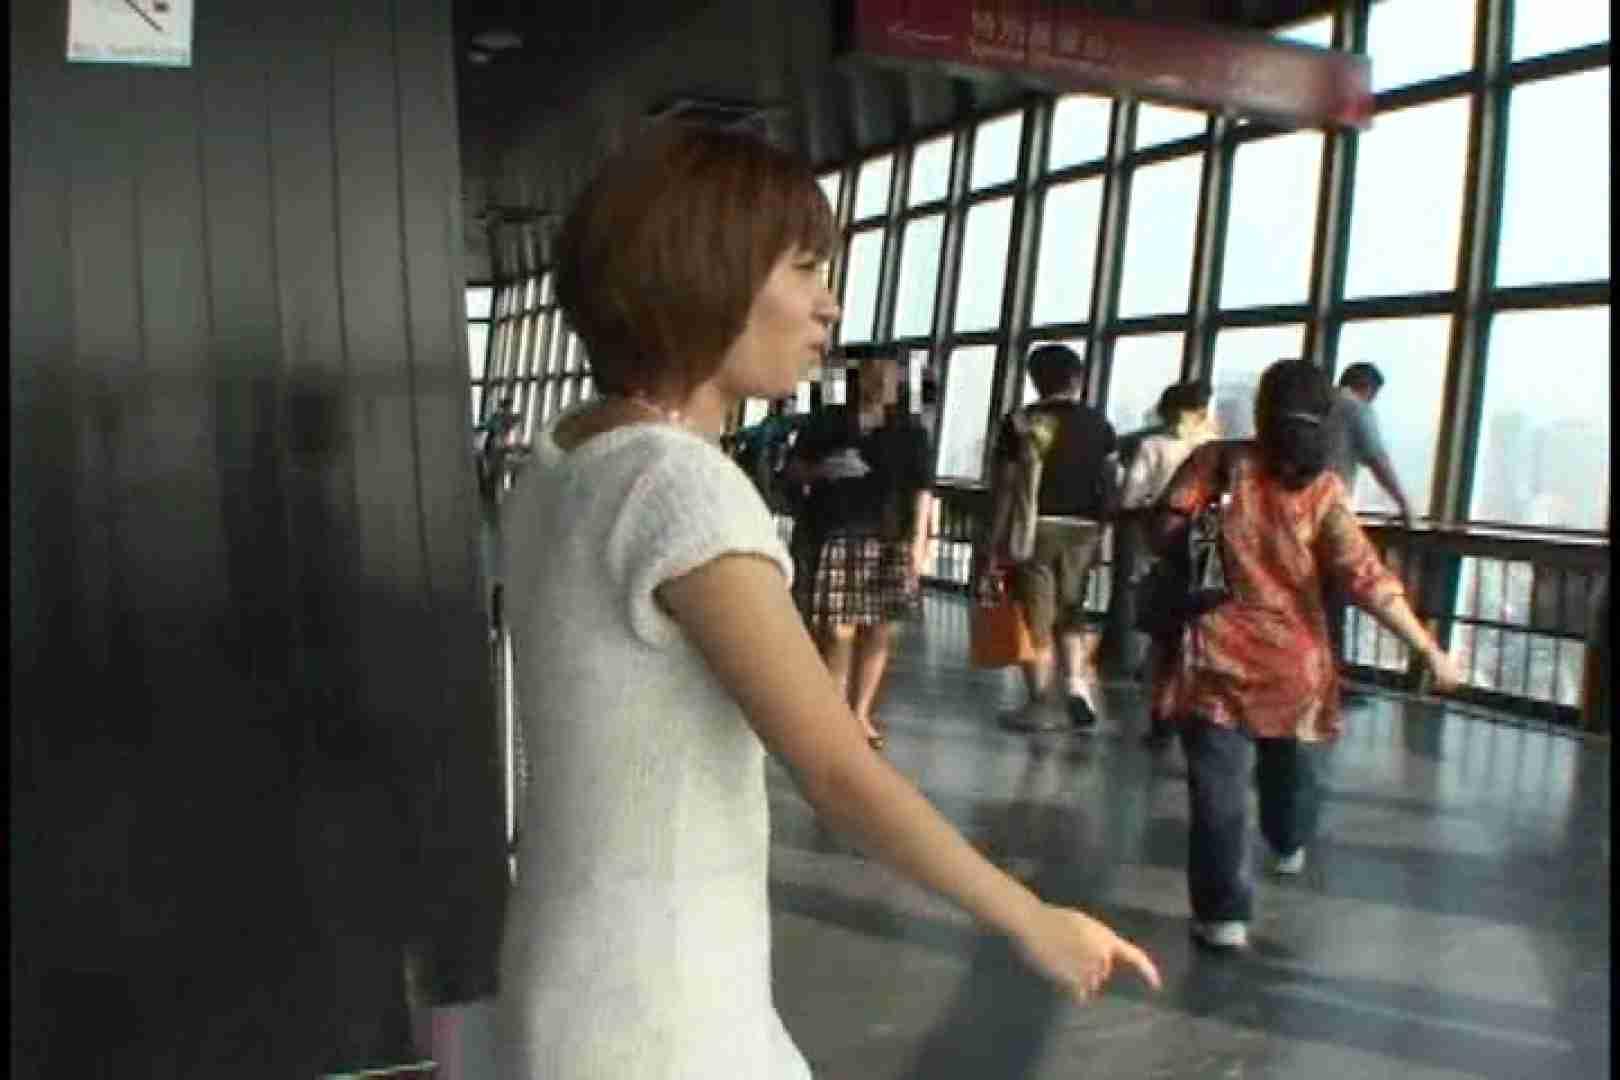 JDハンター全国ツアー vol.026 前編 女子大生のエロ生活   OLのエロ生活  104連発 31